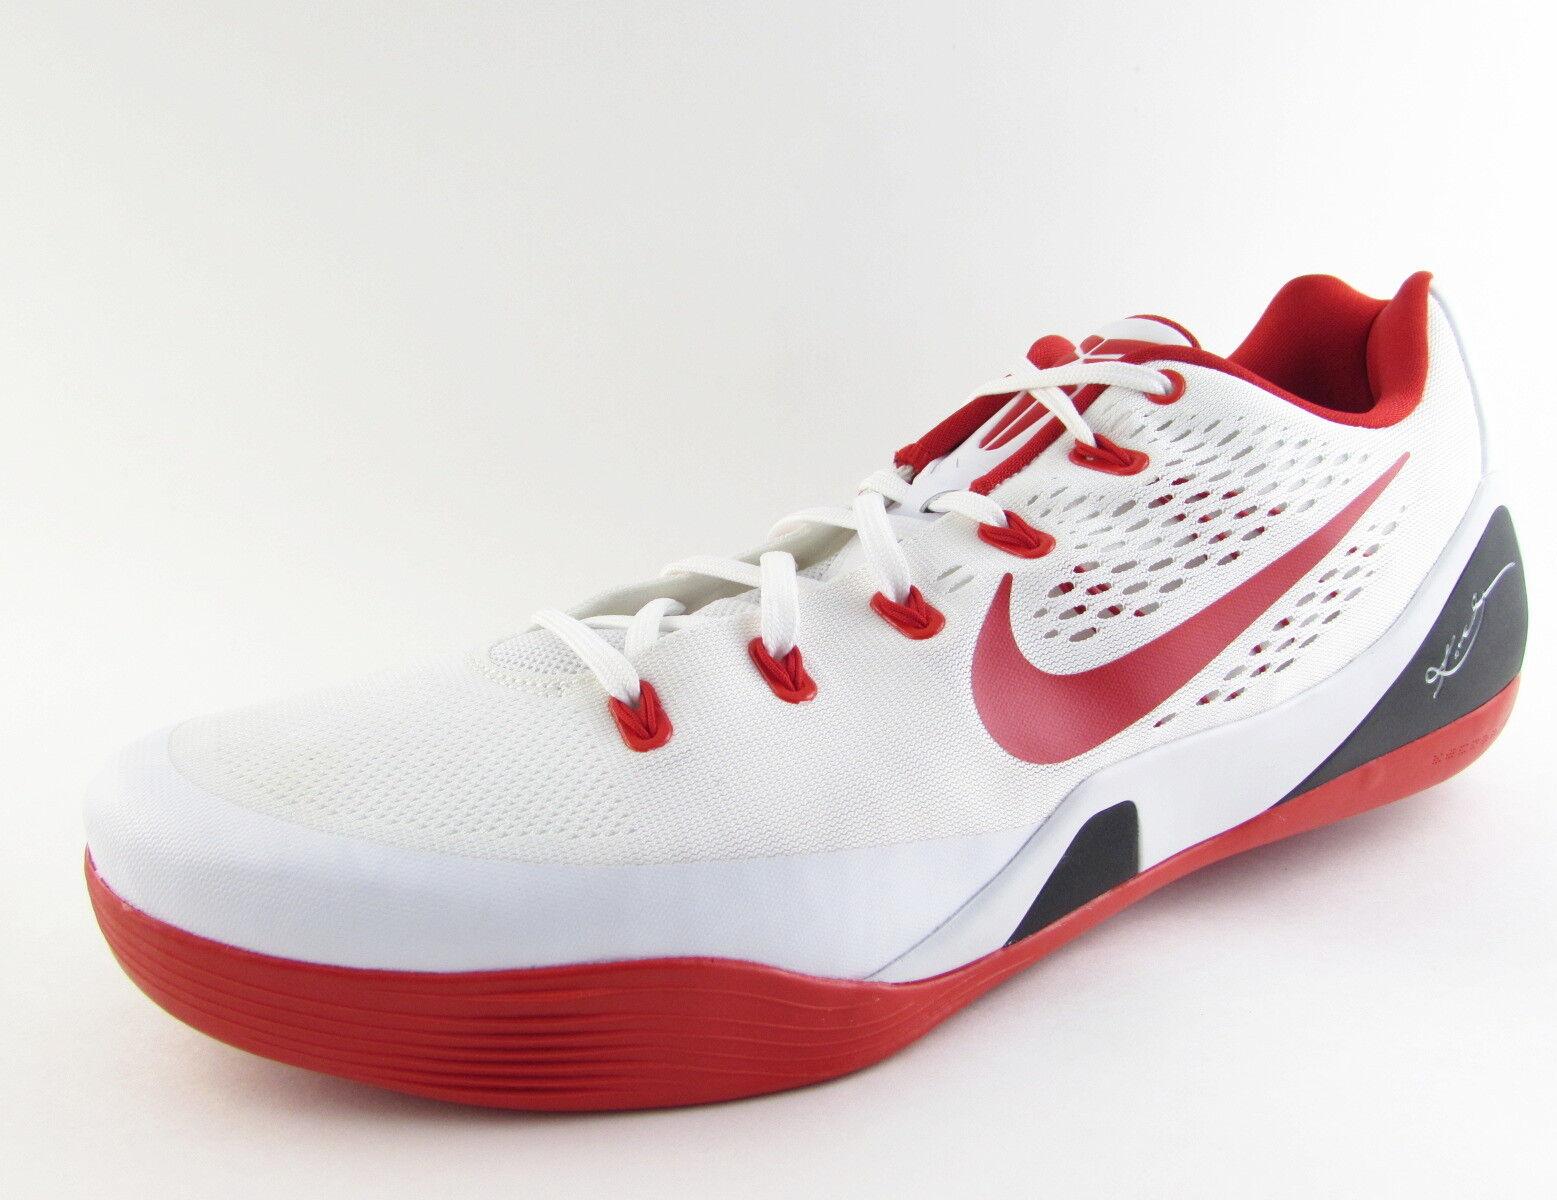 New NIKE KOBE IX 9 Niedrig EM TB Sport ROT LA Lakers Bryant Sport TB Basketball Schuhe Größe 18 843f6f